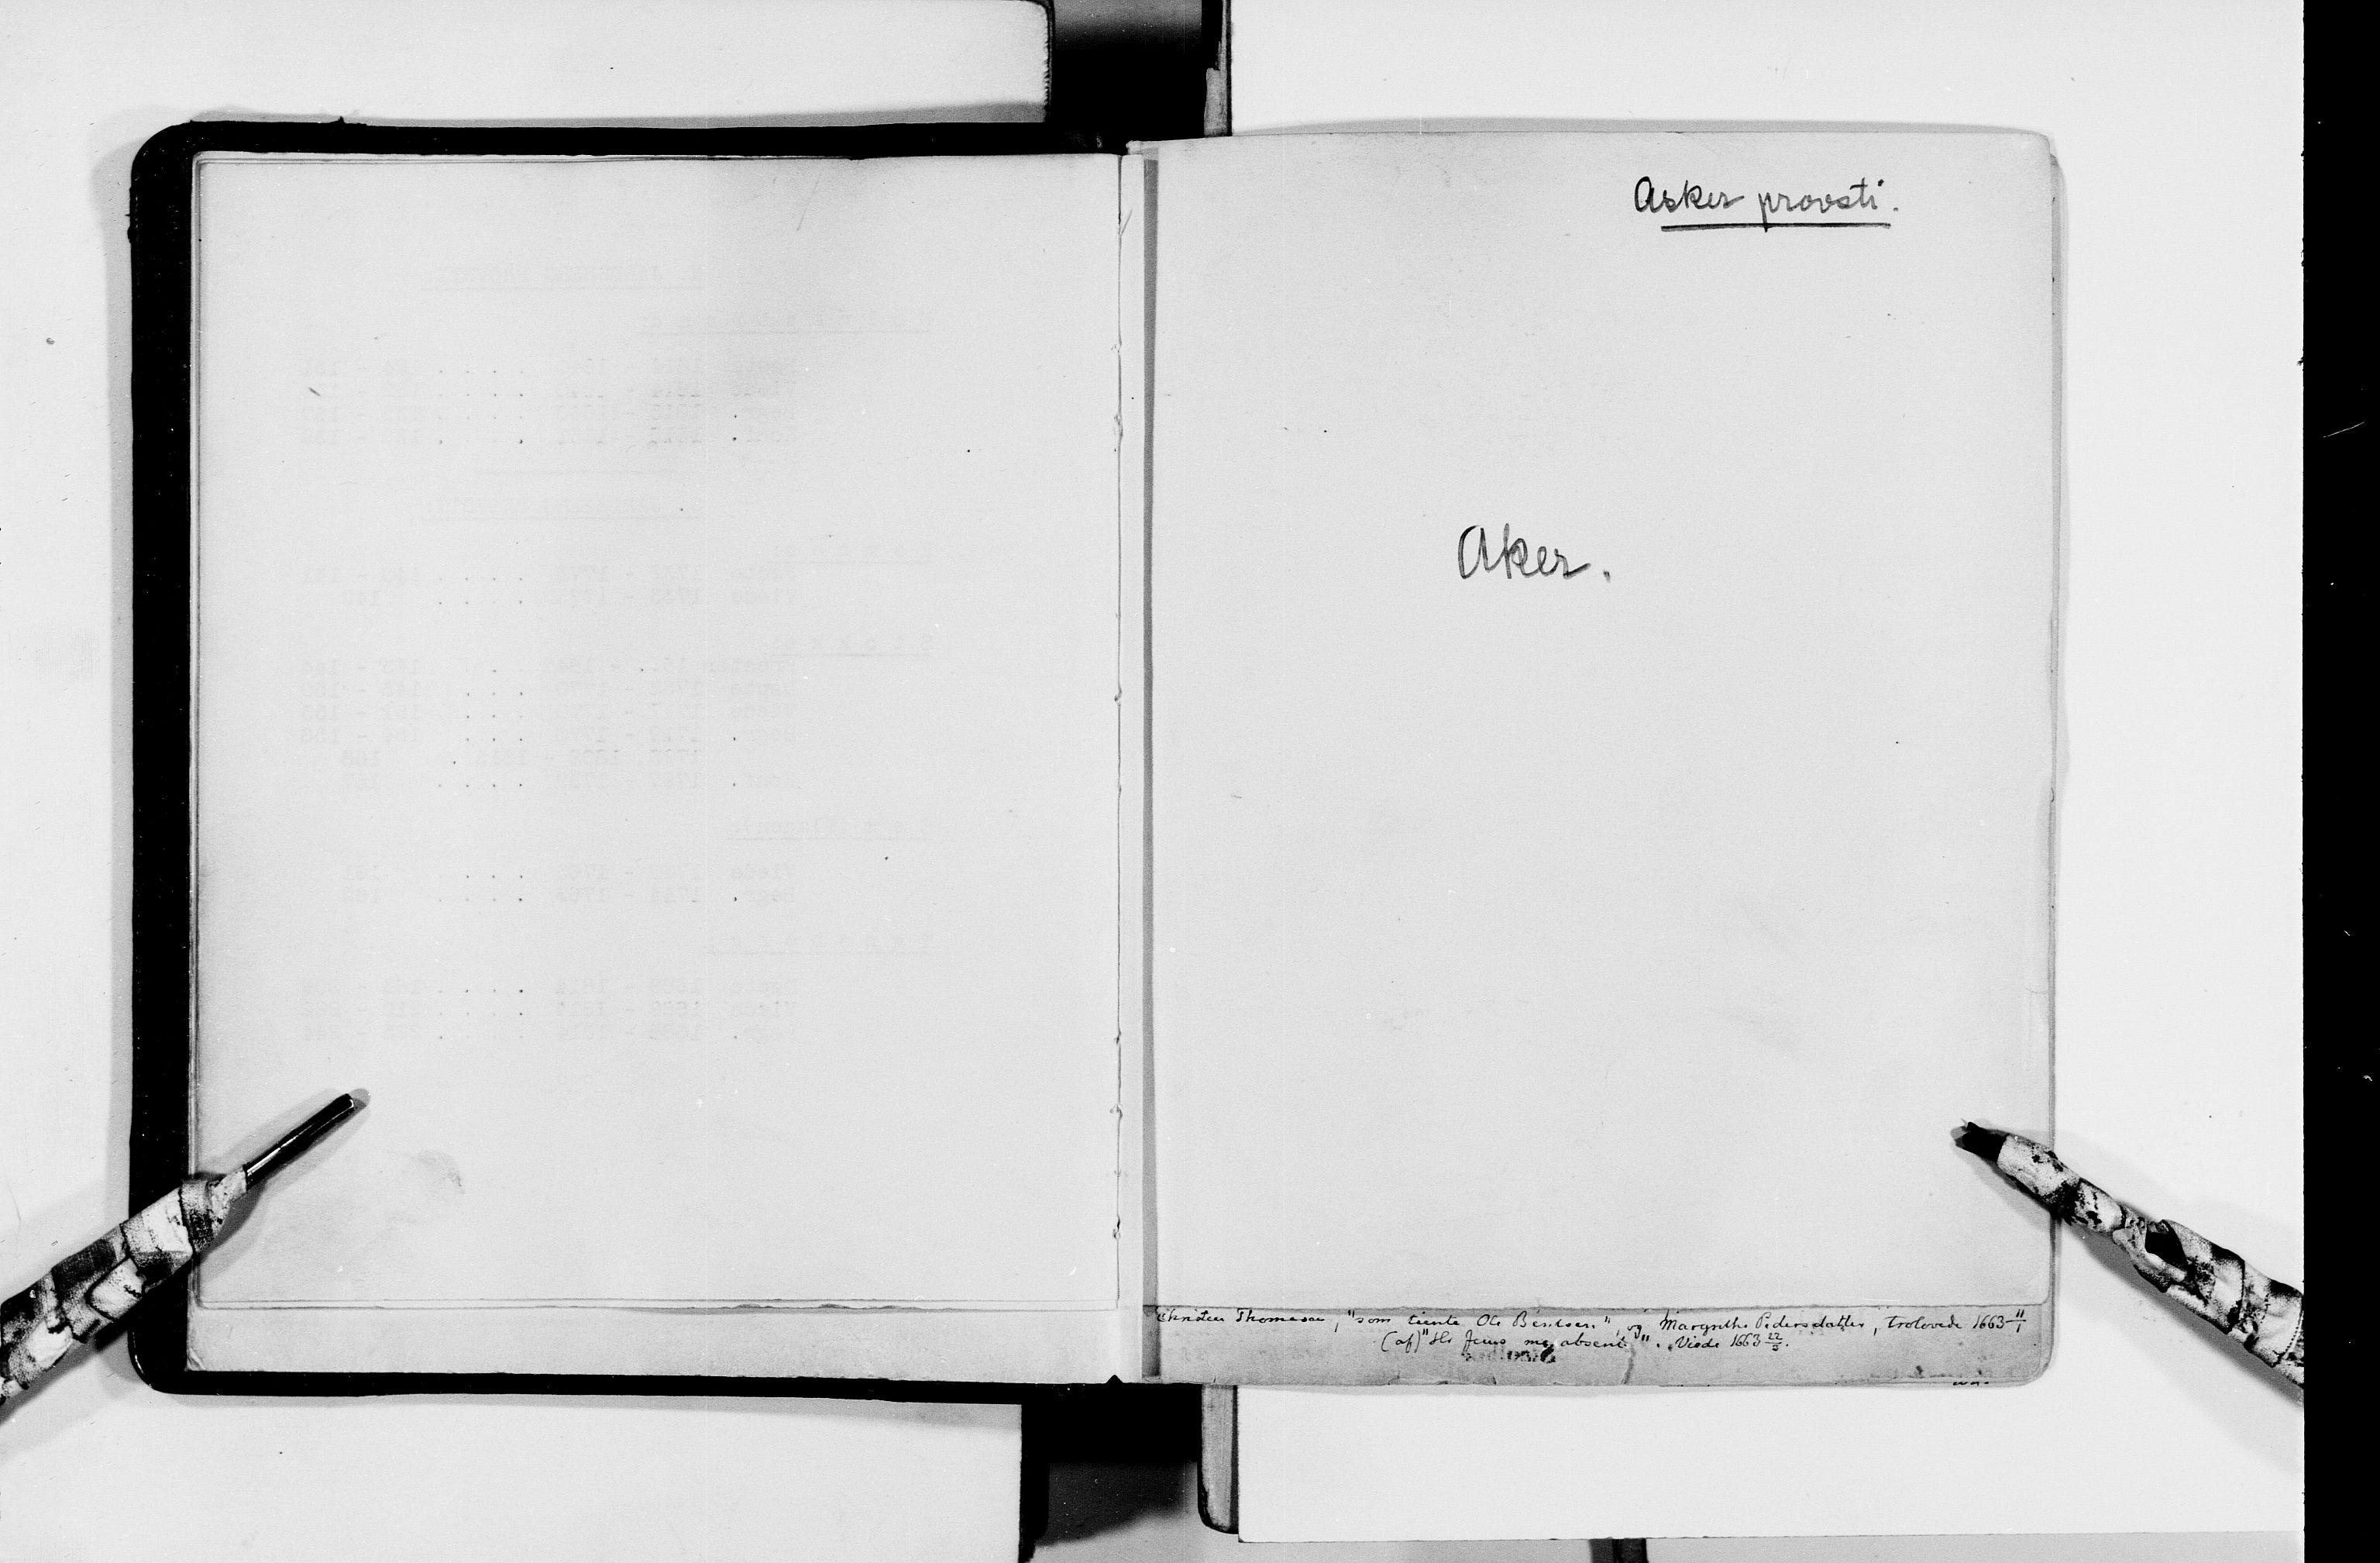 RA, Lassens samlinger, F/Fc, s. upaginert